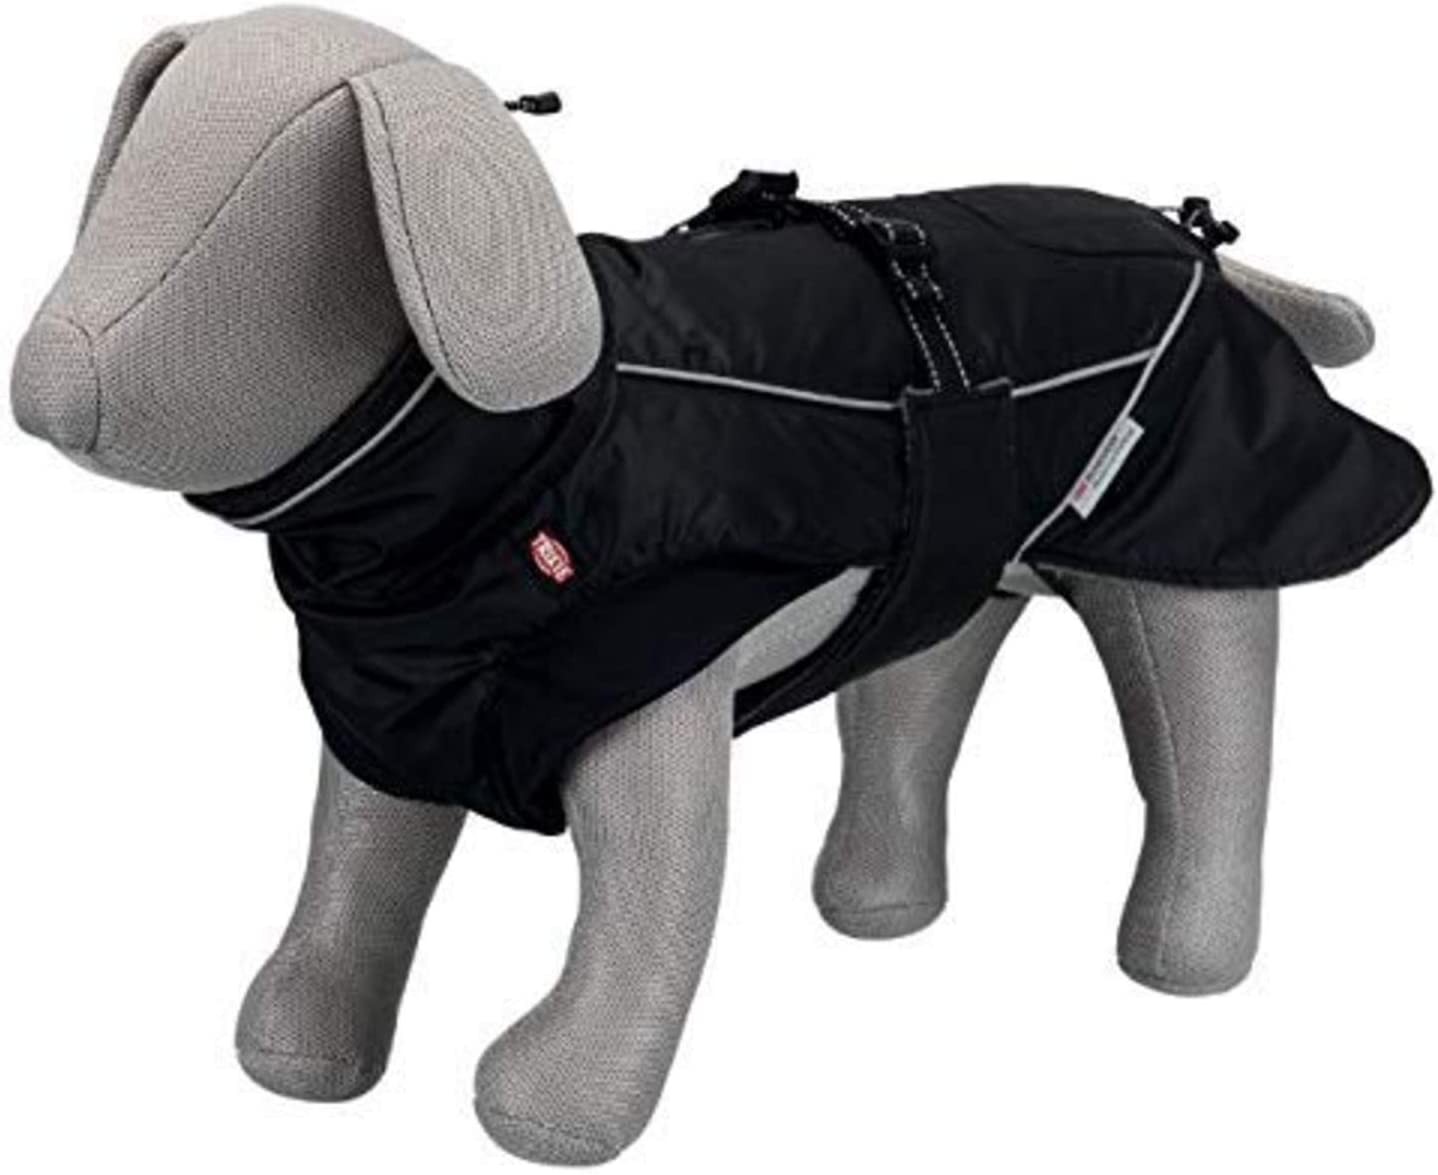 Trixie Abrigo Perro Ropa Mascotas - Chaqueta Capa Chaleco Chubasquero Perro Grande Pequeño Mediano Impermeable Perros Accesorios Brizon TallaL 55 cm Negro